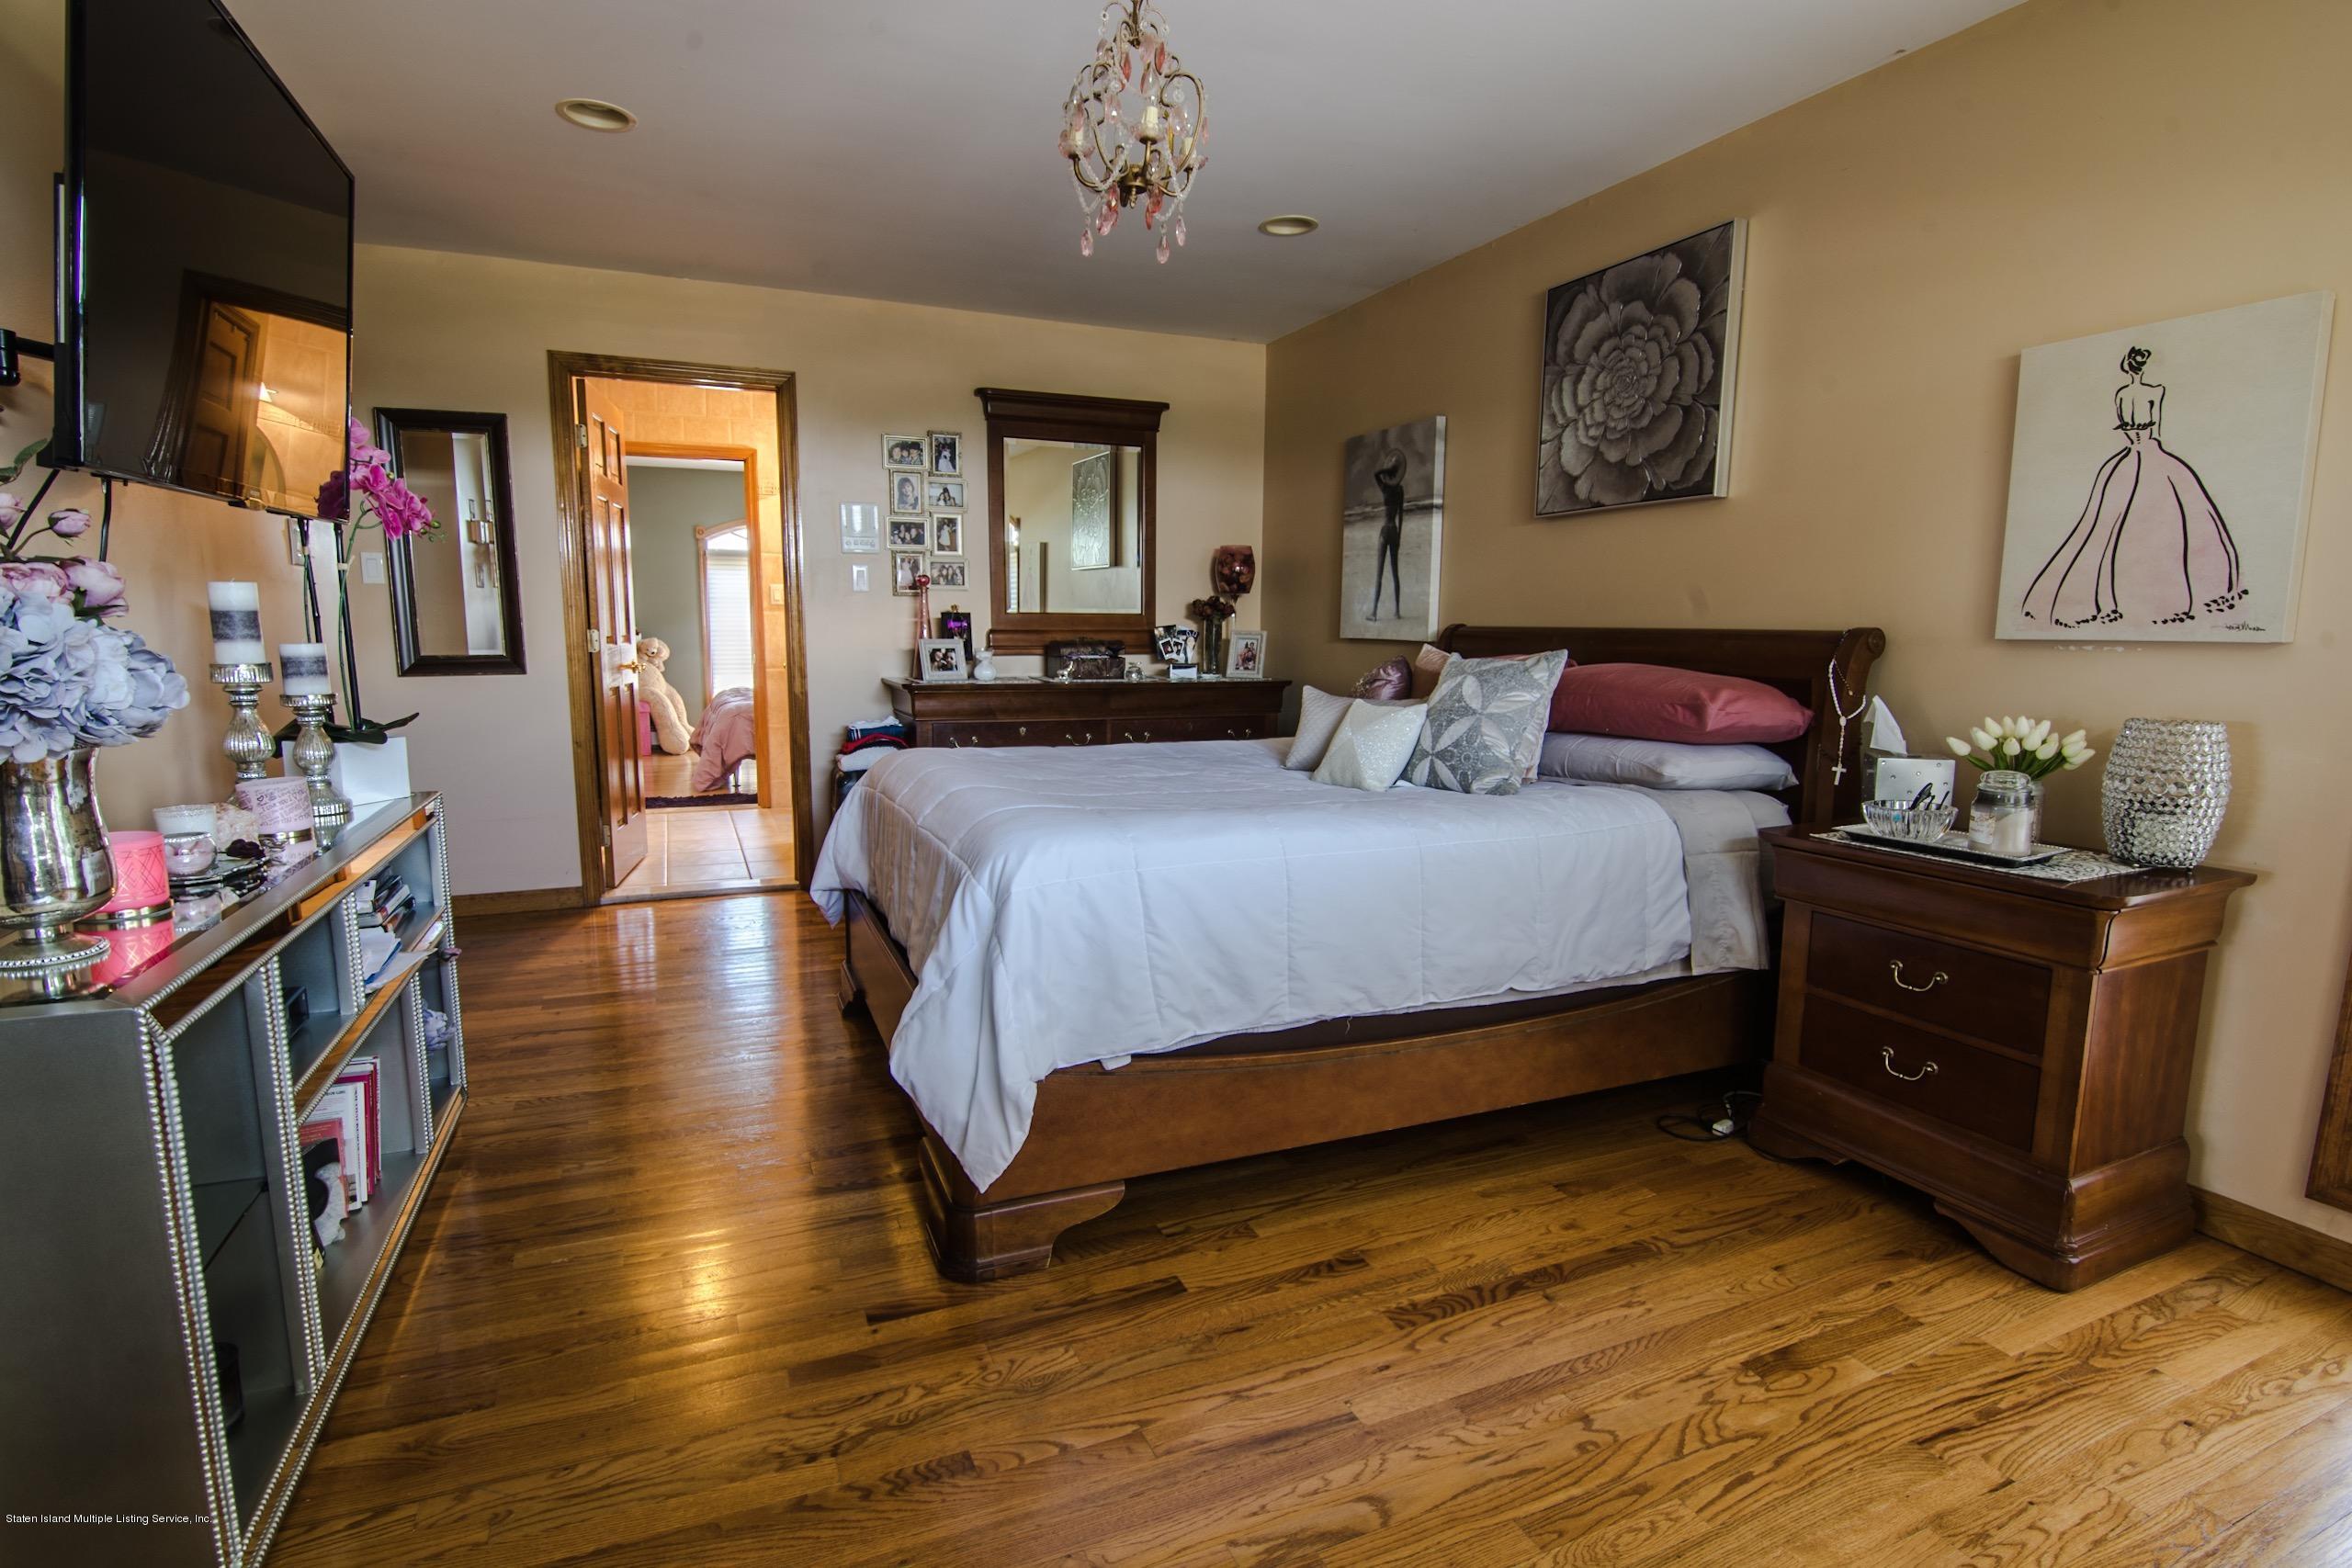 Single Family - Detached 120 Milden Avenue  Staten Island, NY 10301, MLS-1121068-13